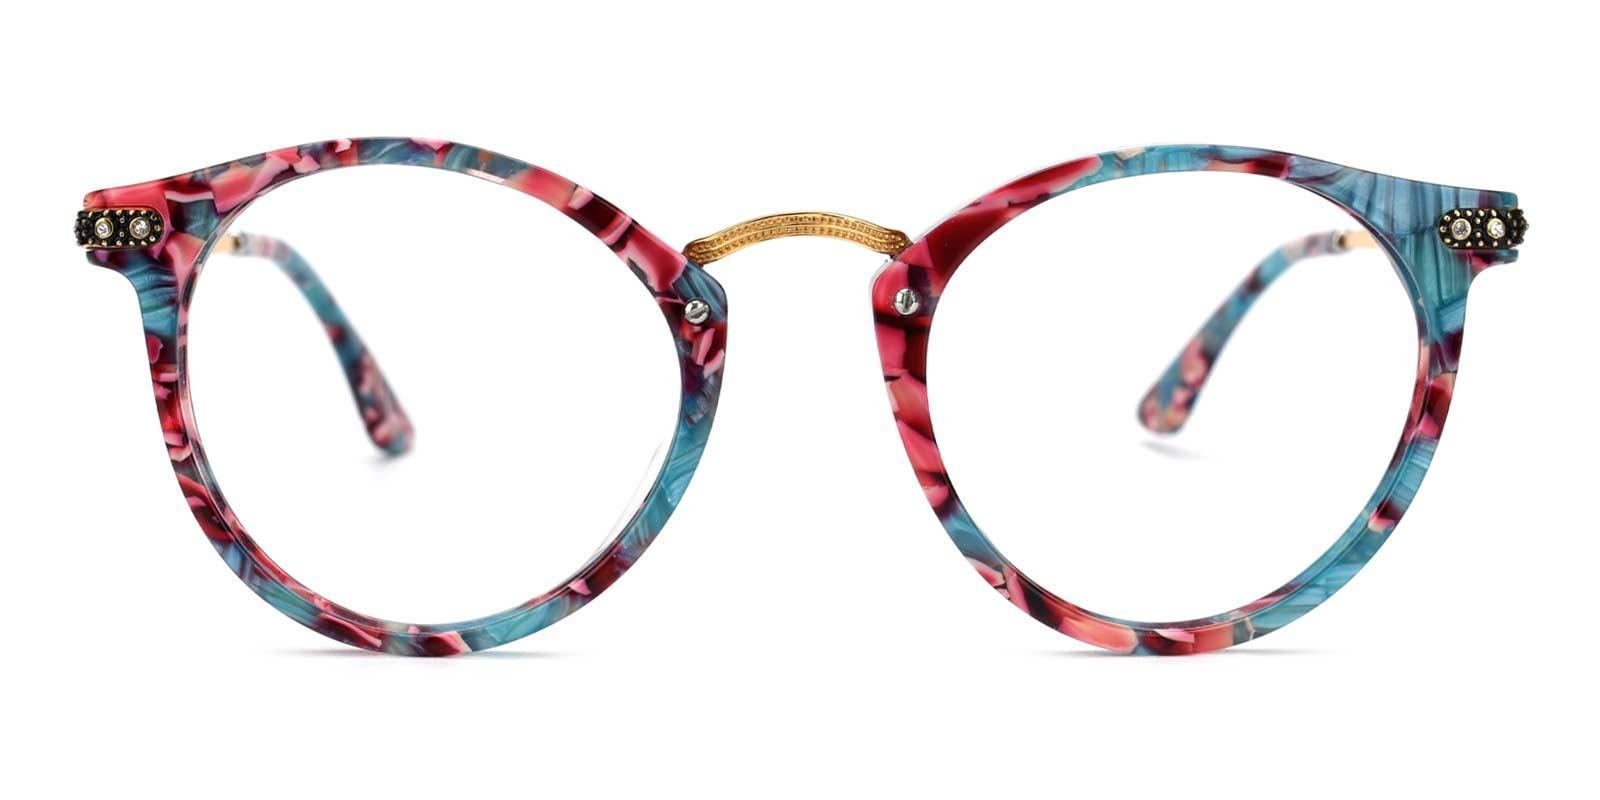 Donna-Pattern-Round-Acetate-Eyeglasses-detail